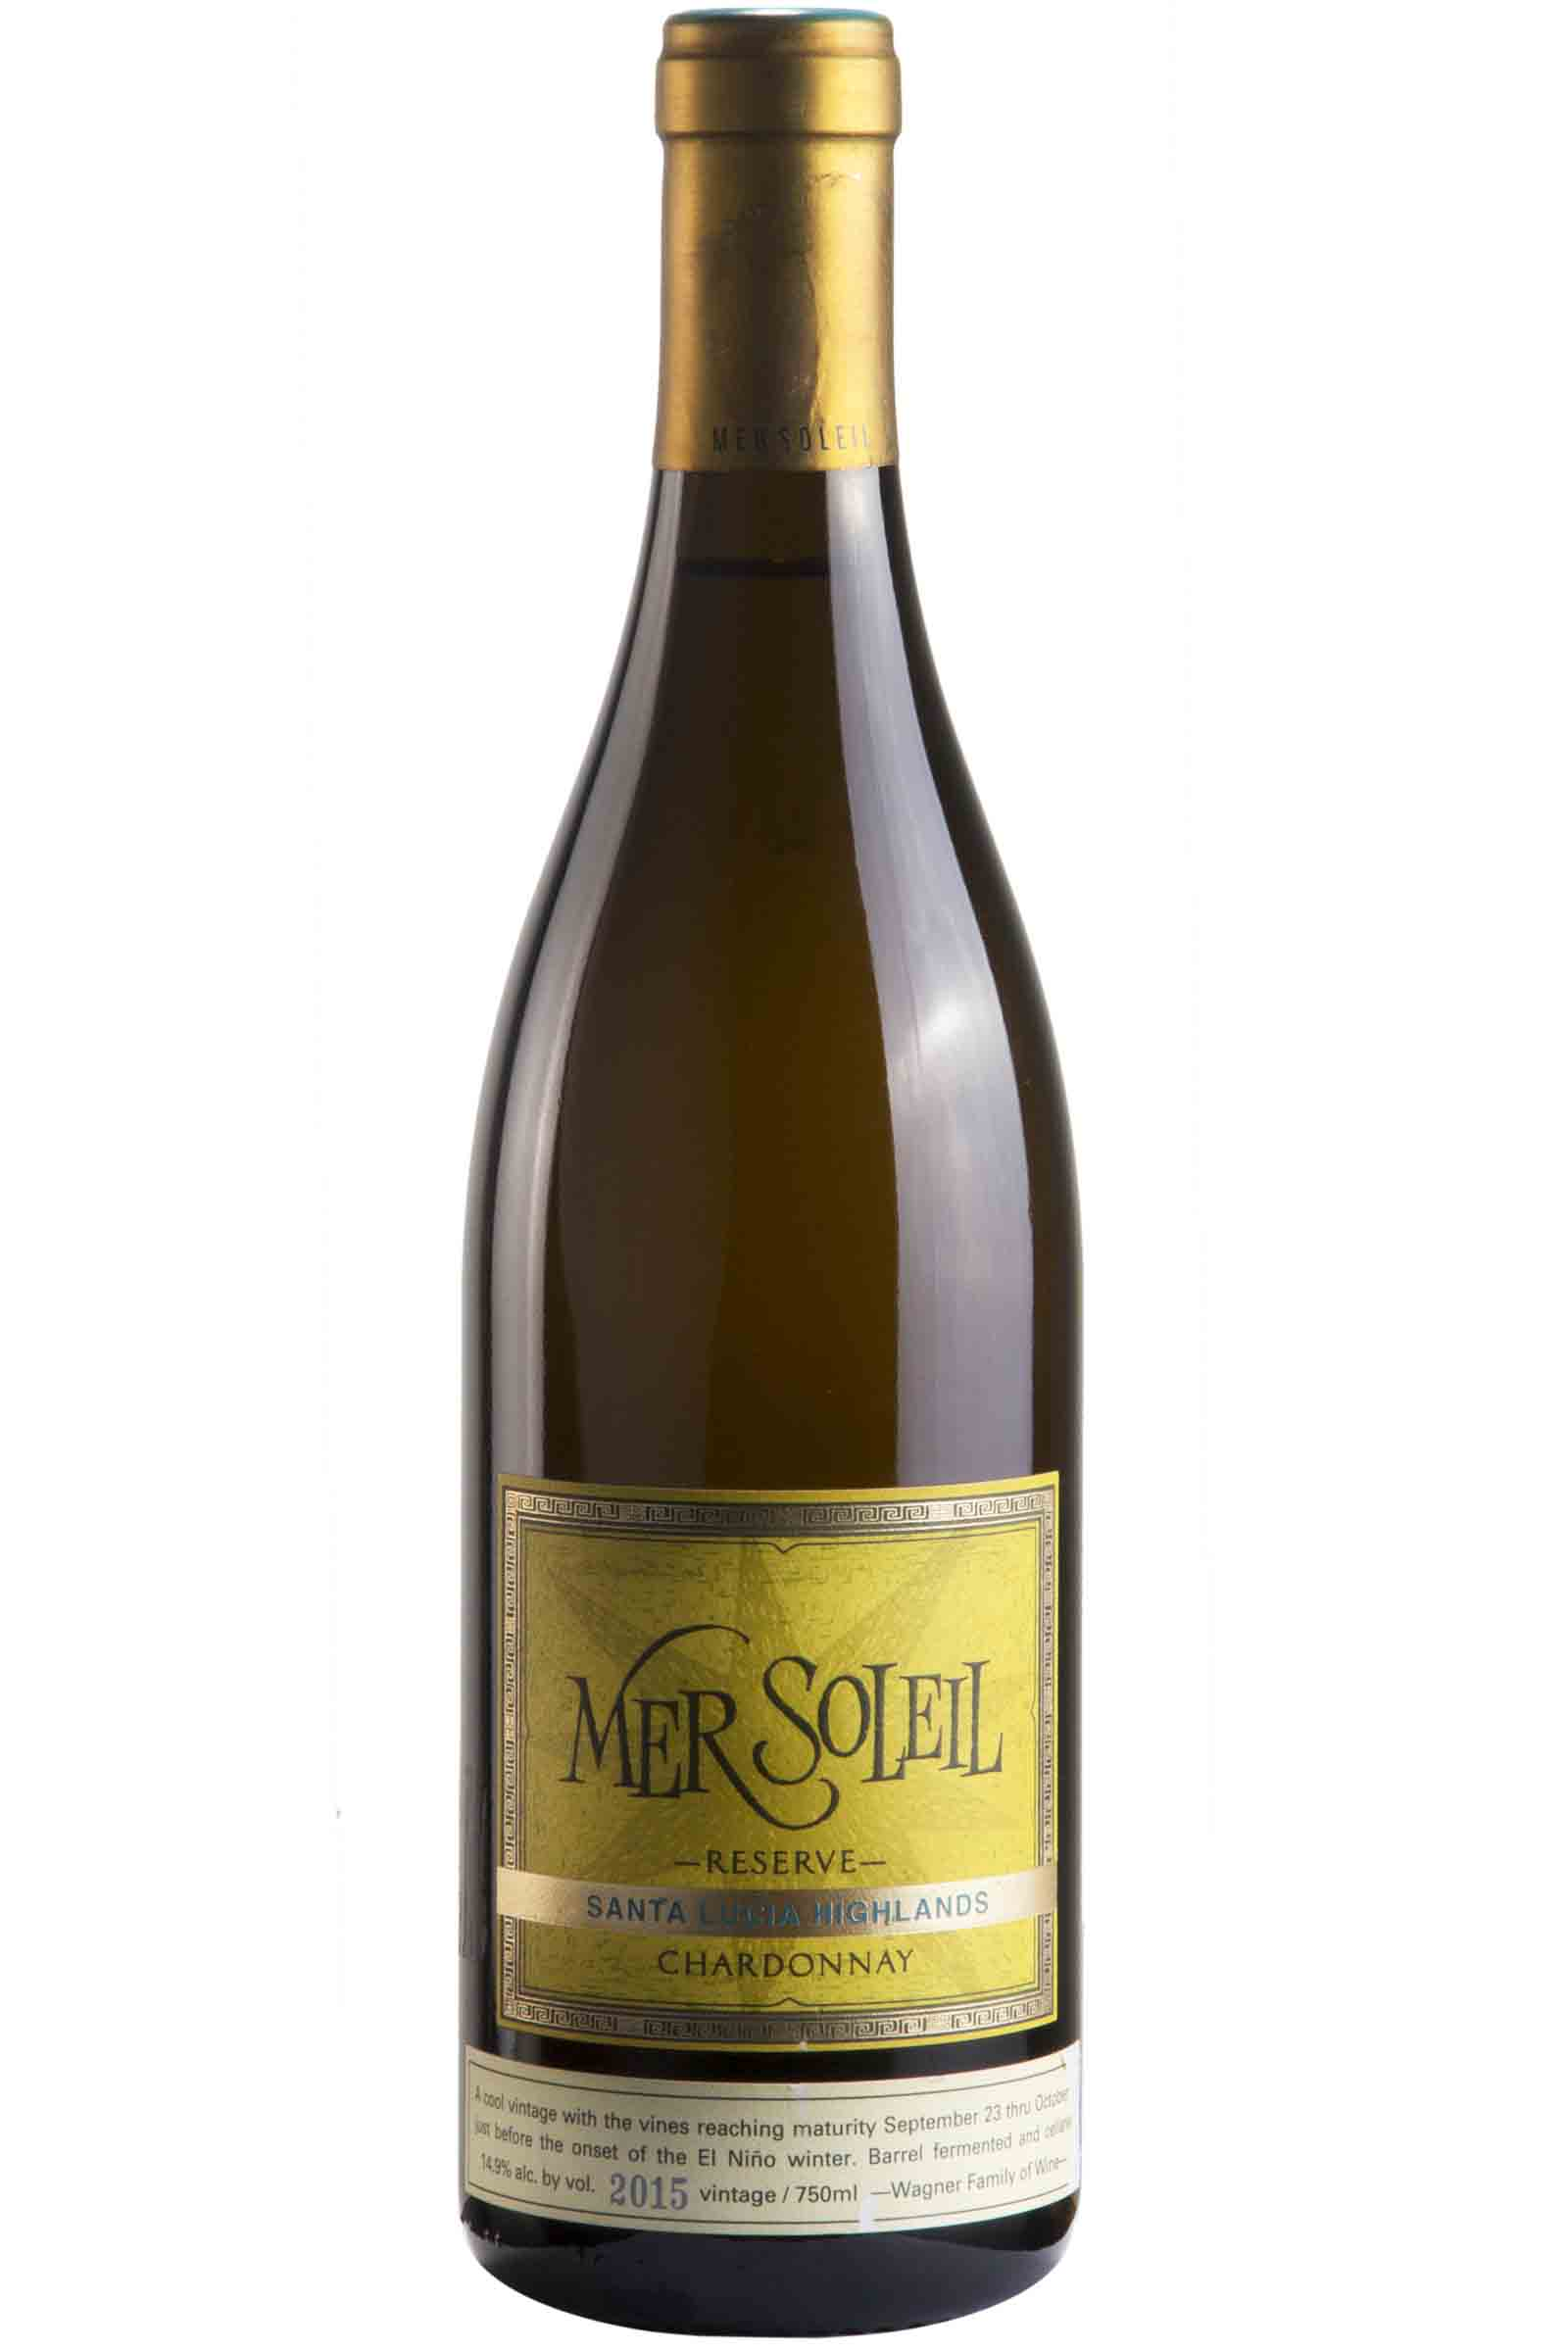 Vino Mer Soleil Reserva Chardonnay 750ml